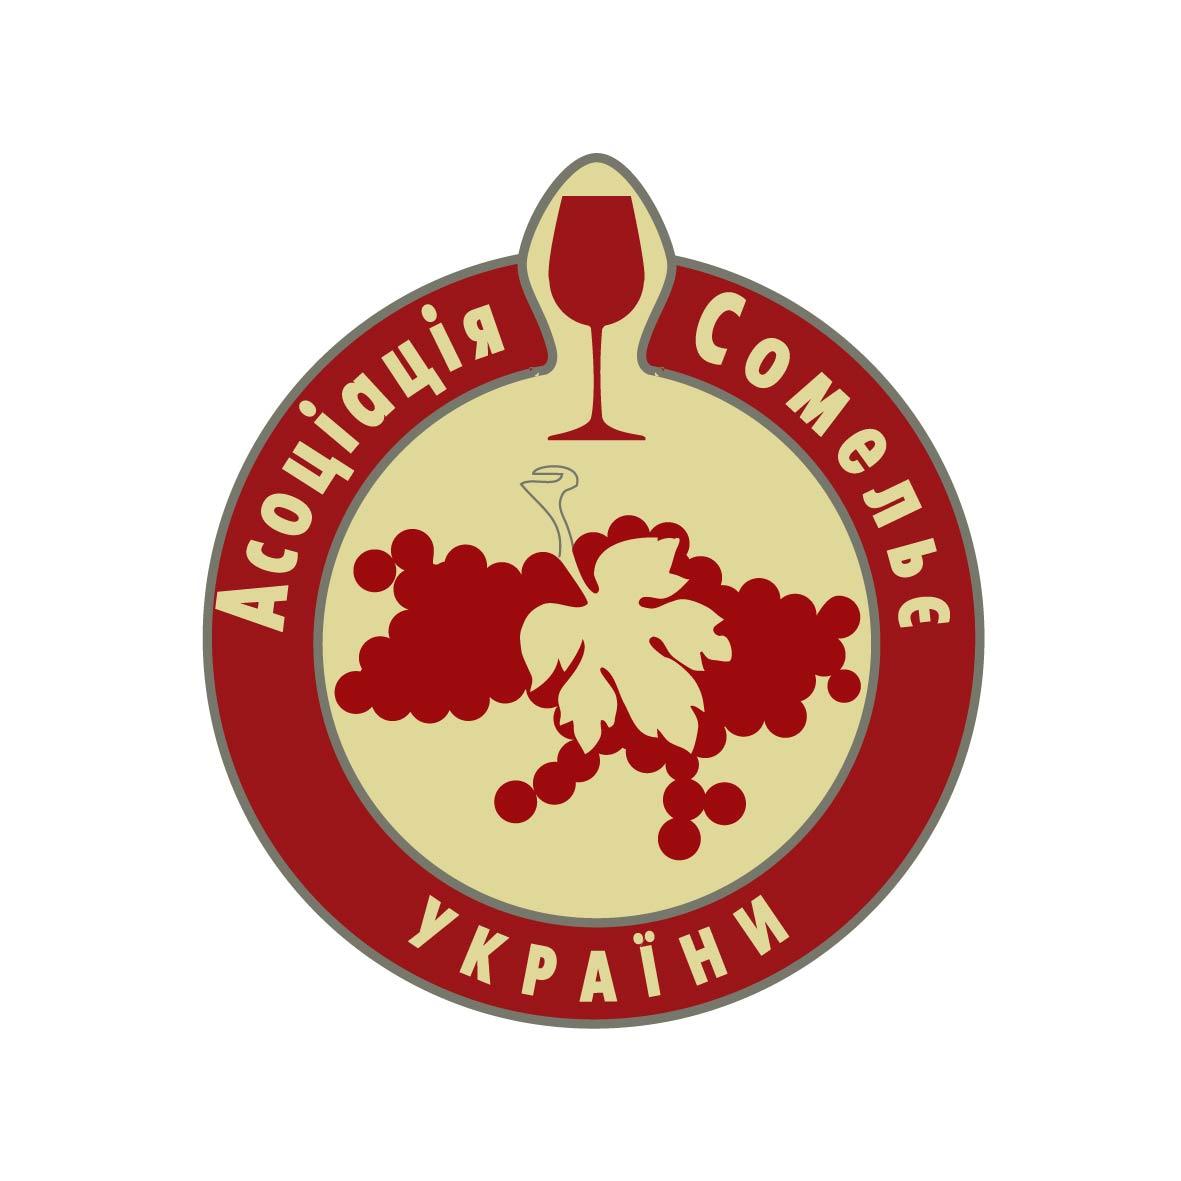 Фото: Логотип Ассоциации сомелье Украины.